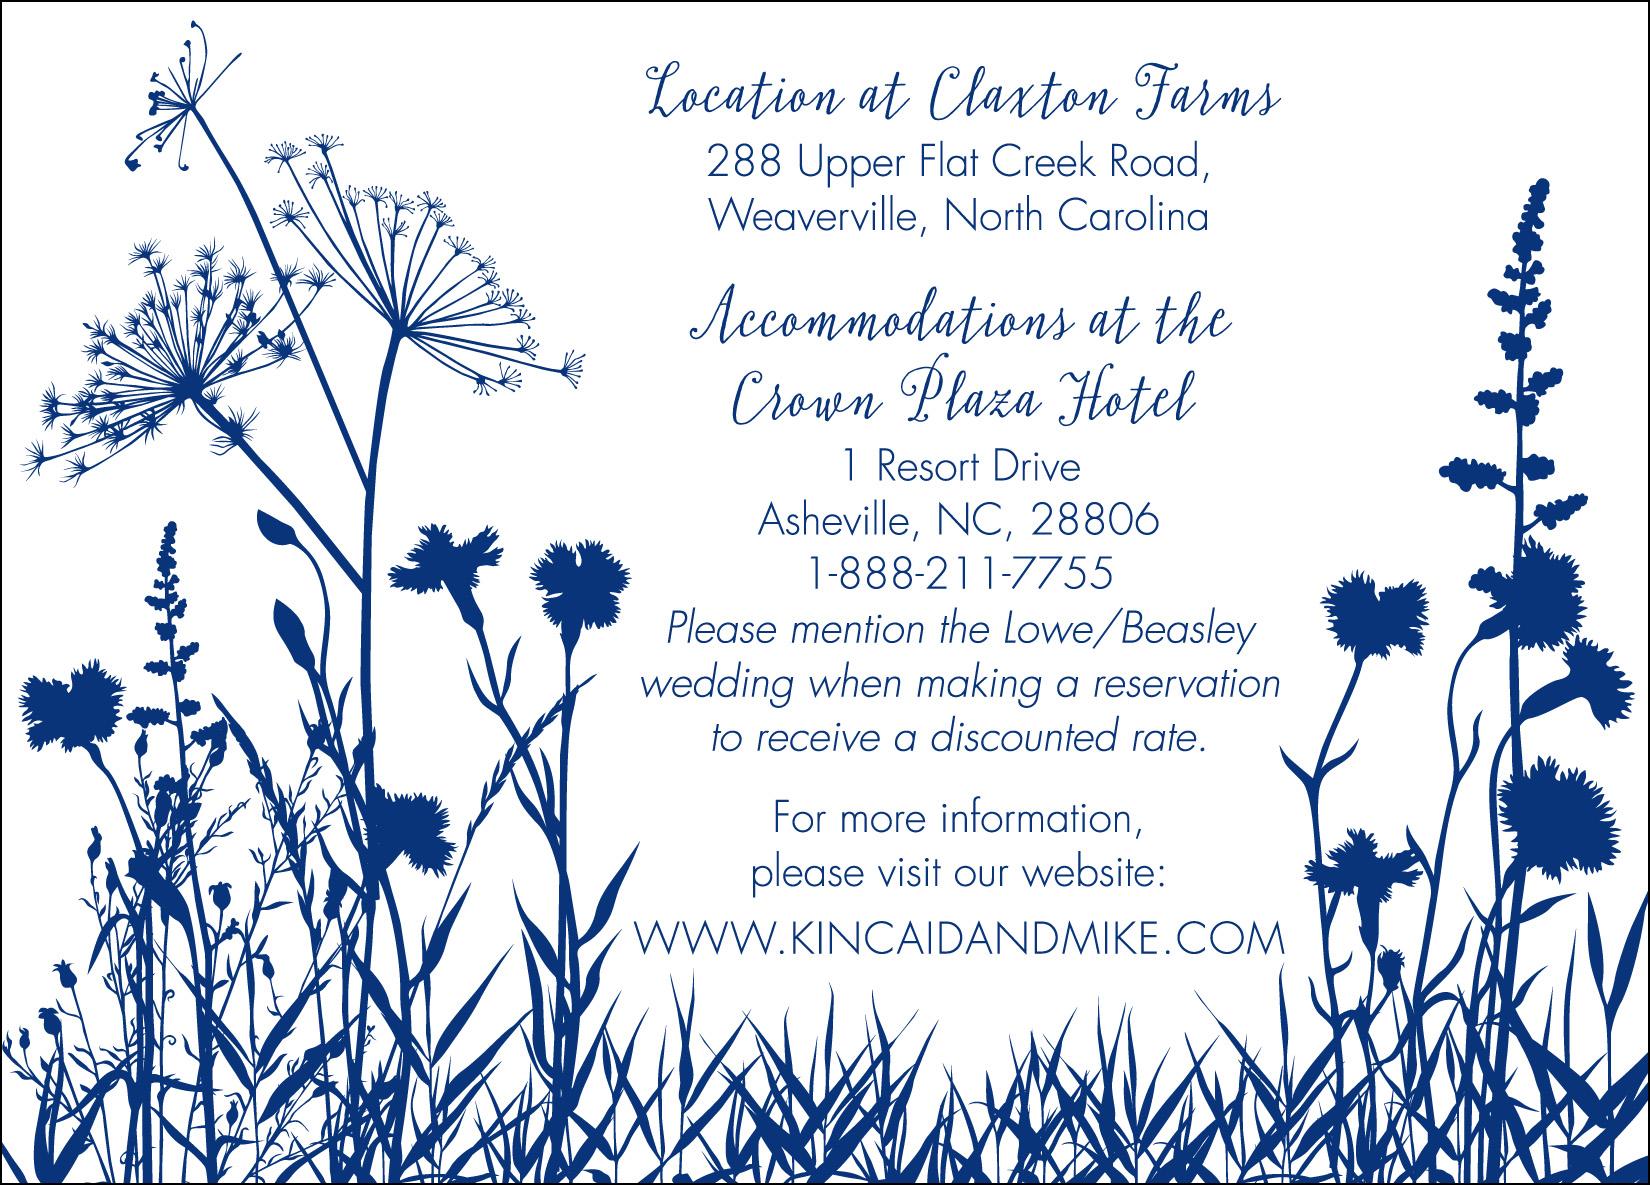 Lowe-Beasley Wedding, Info Card